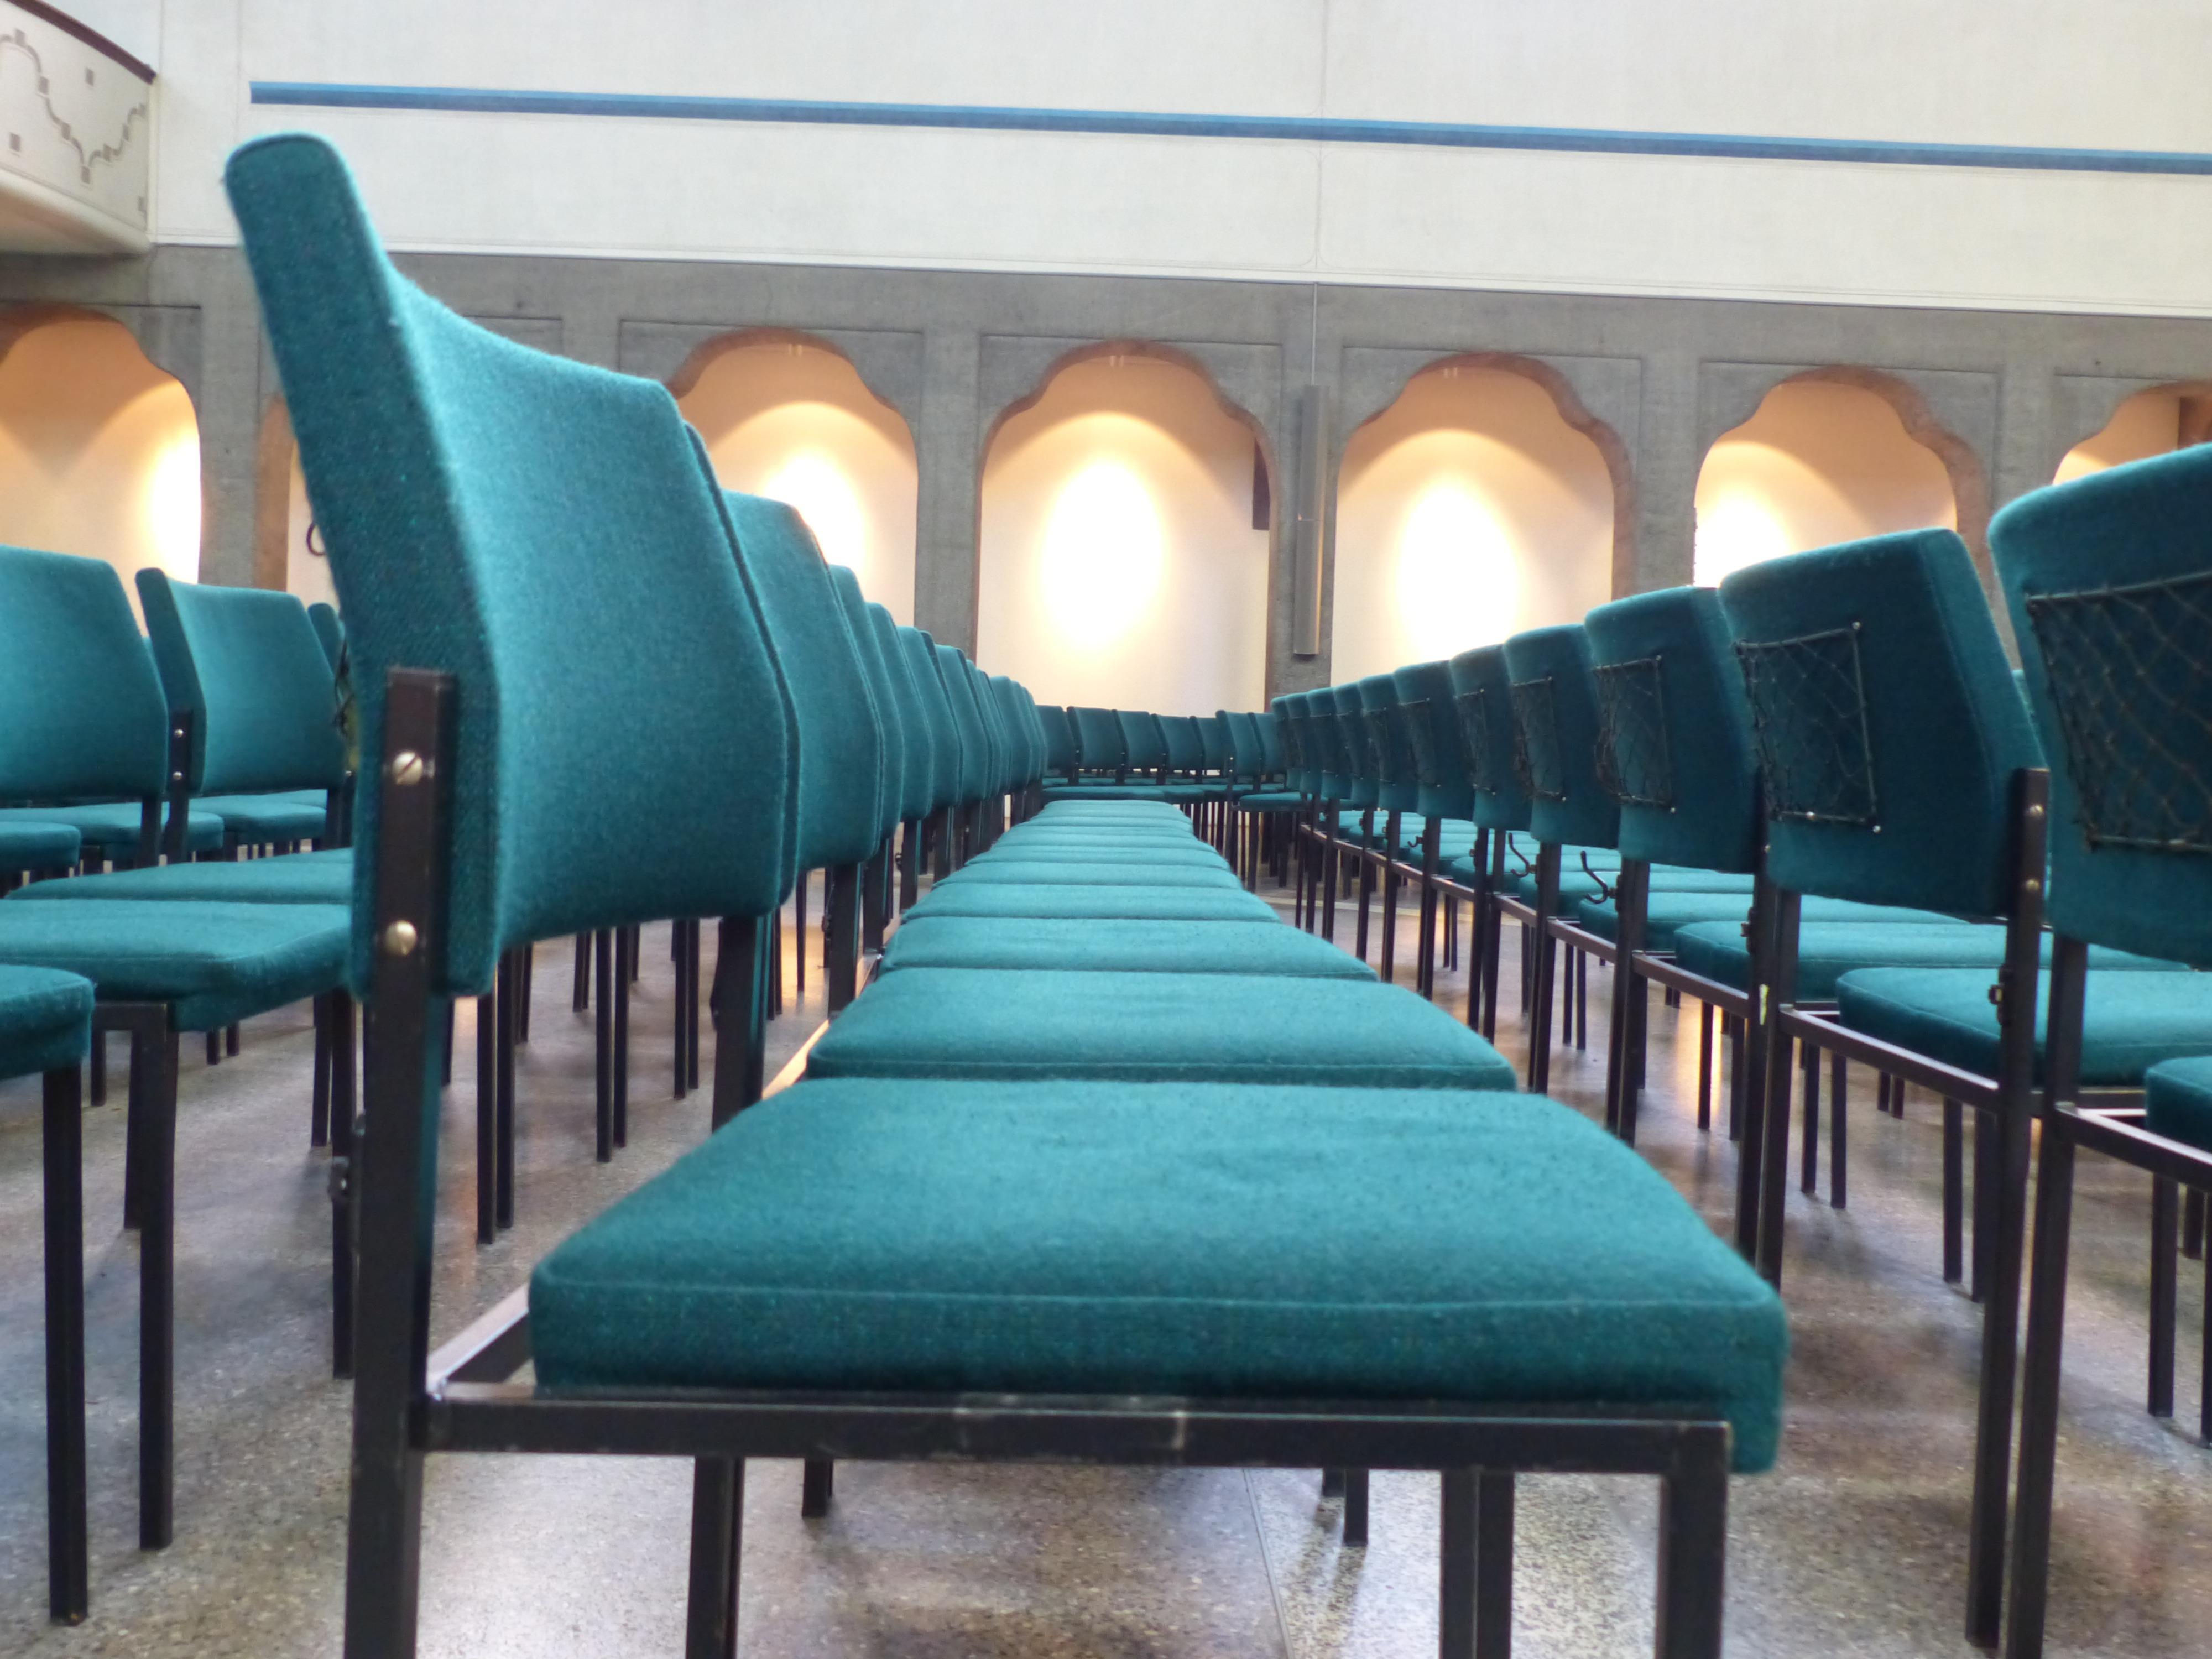 Kostenlose foto : Tabelle, Auditorium, Sessel, Sitz, Grün, Halle ...